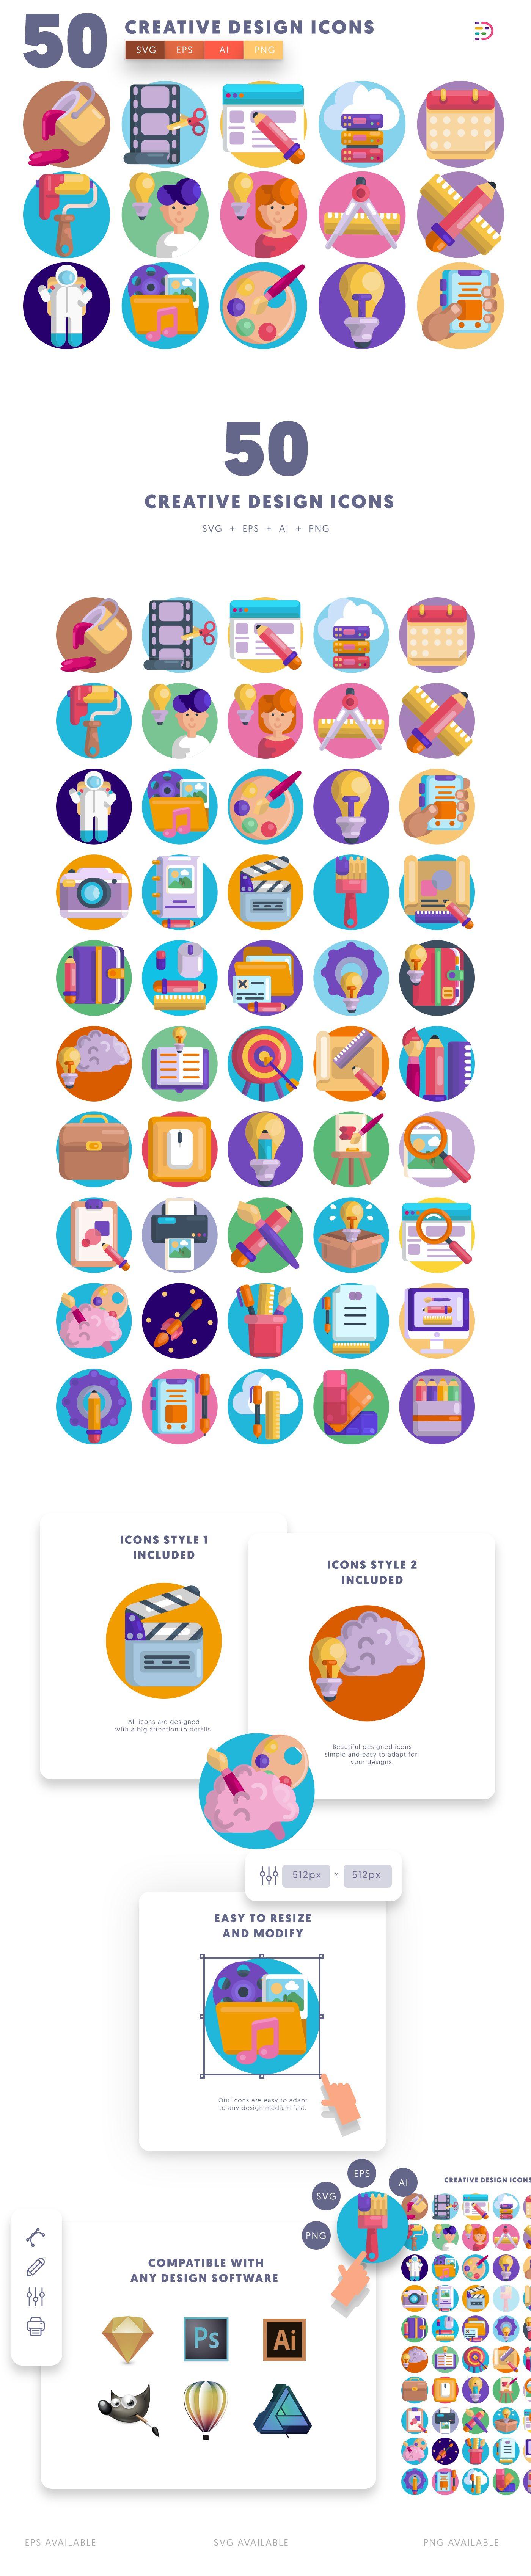 Creative Design icons info graphic